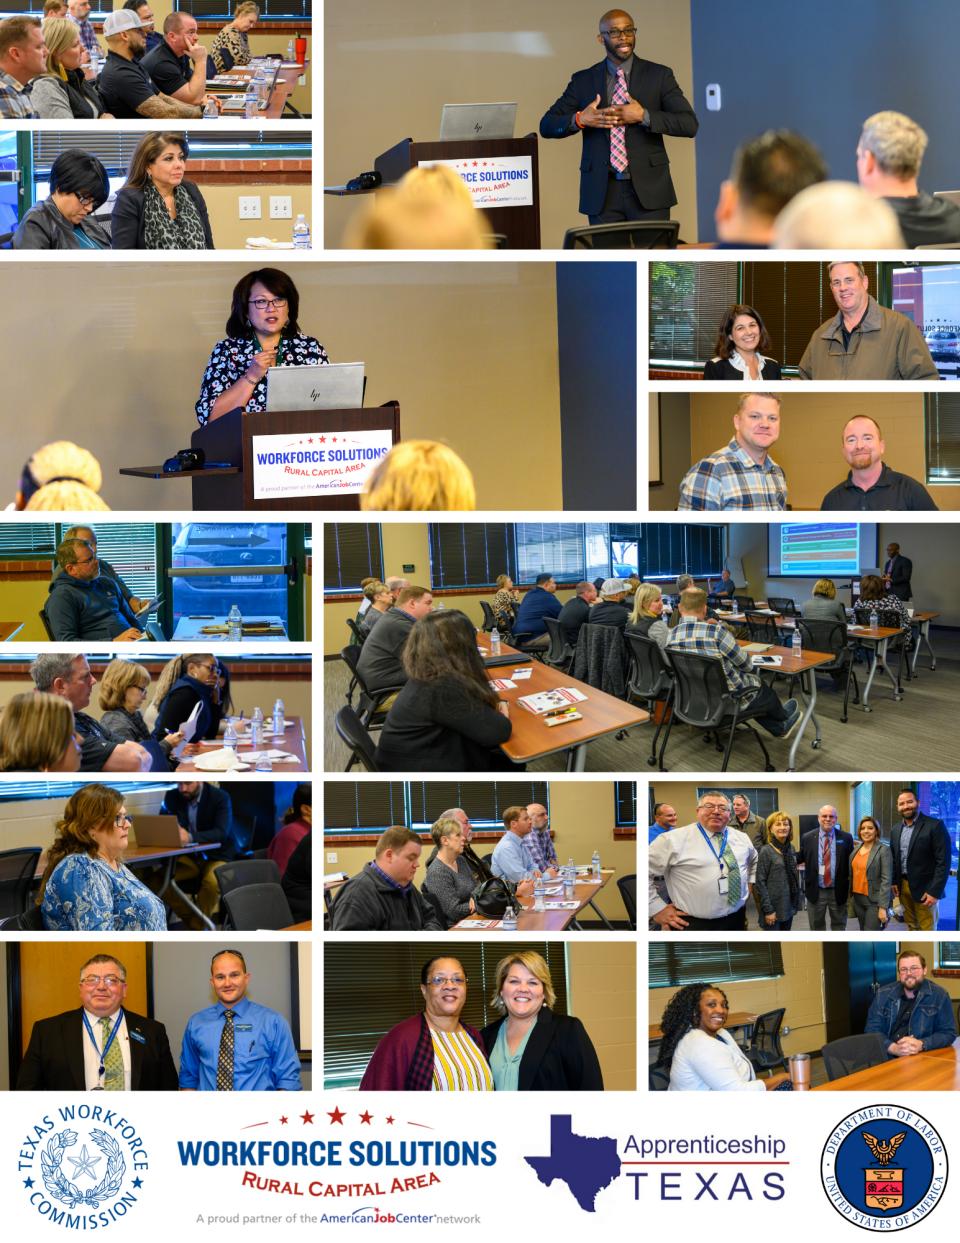 WSRCA Hosts Apprenticeship Seminar for Employers